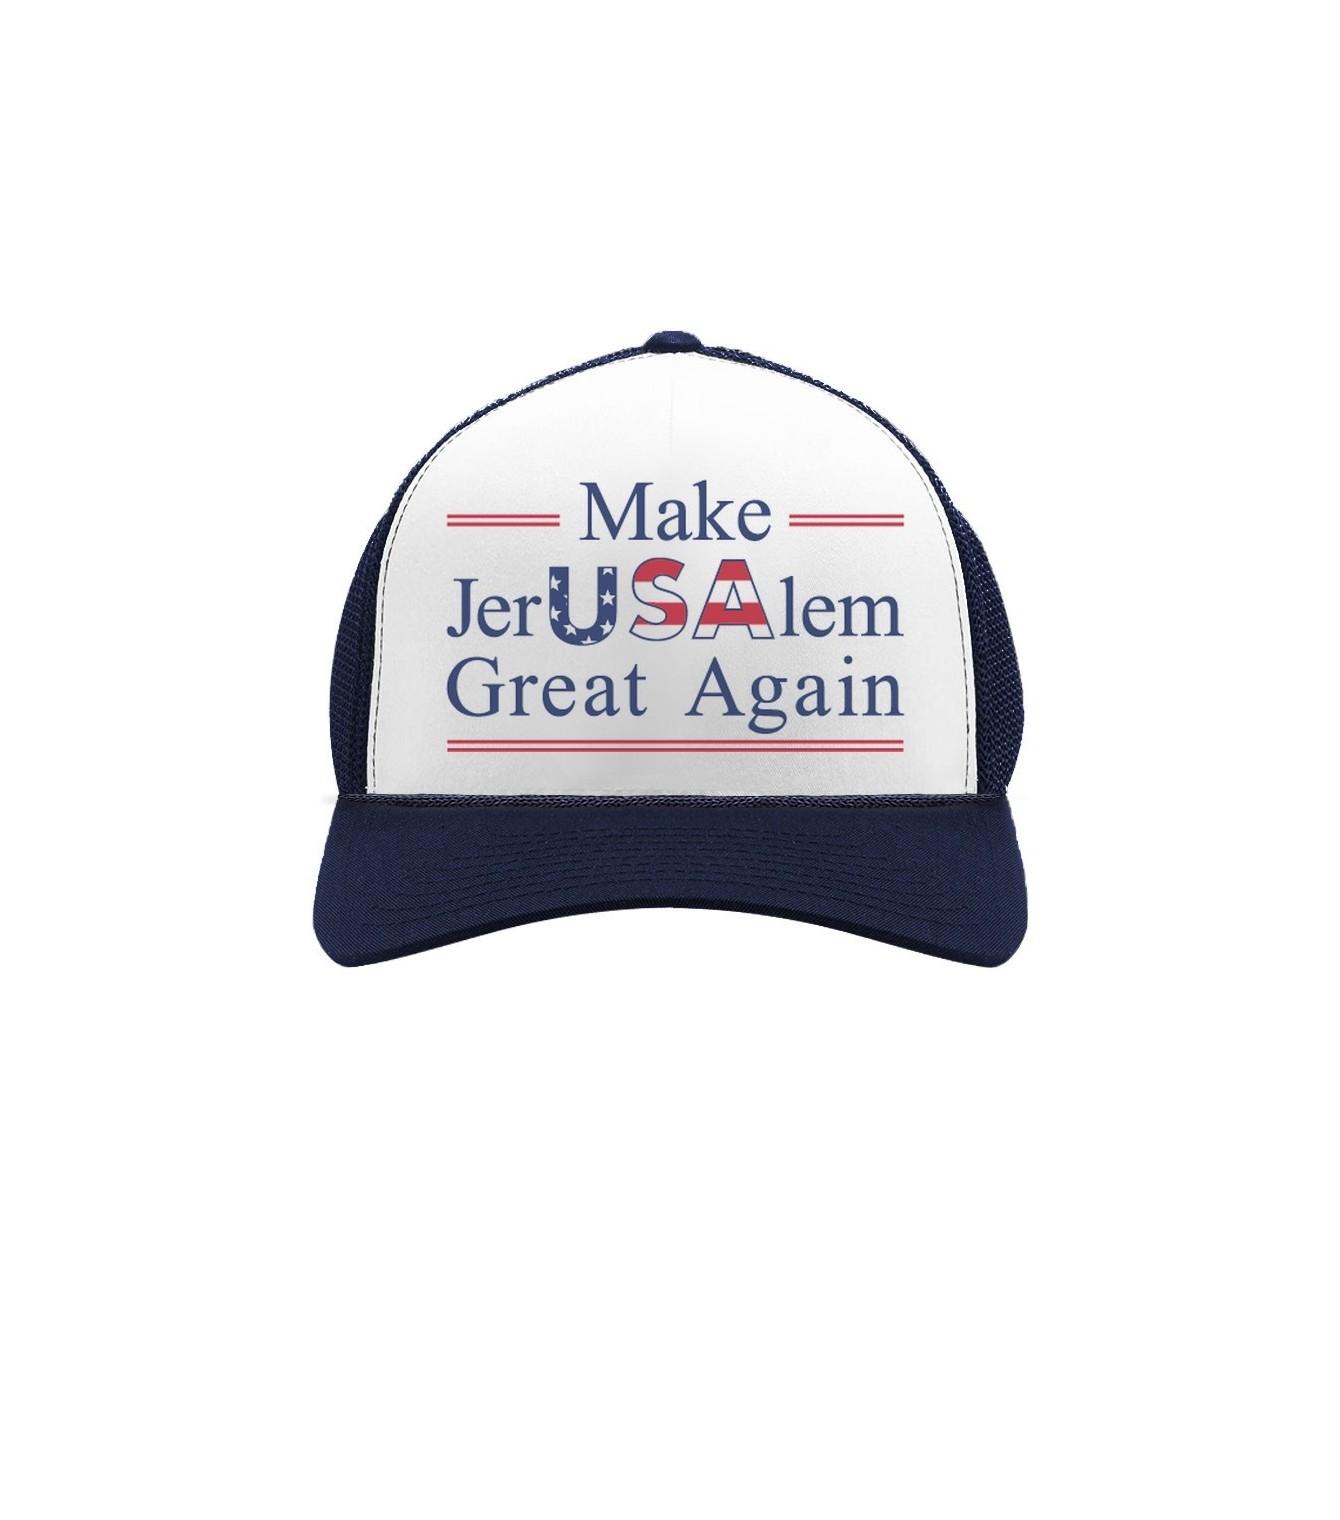 15bf20548 Make Jerusalem Great Again Trump Declaration Cap